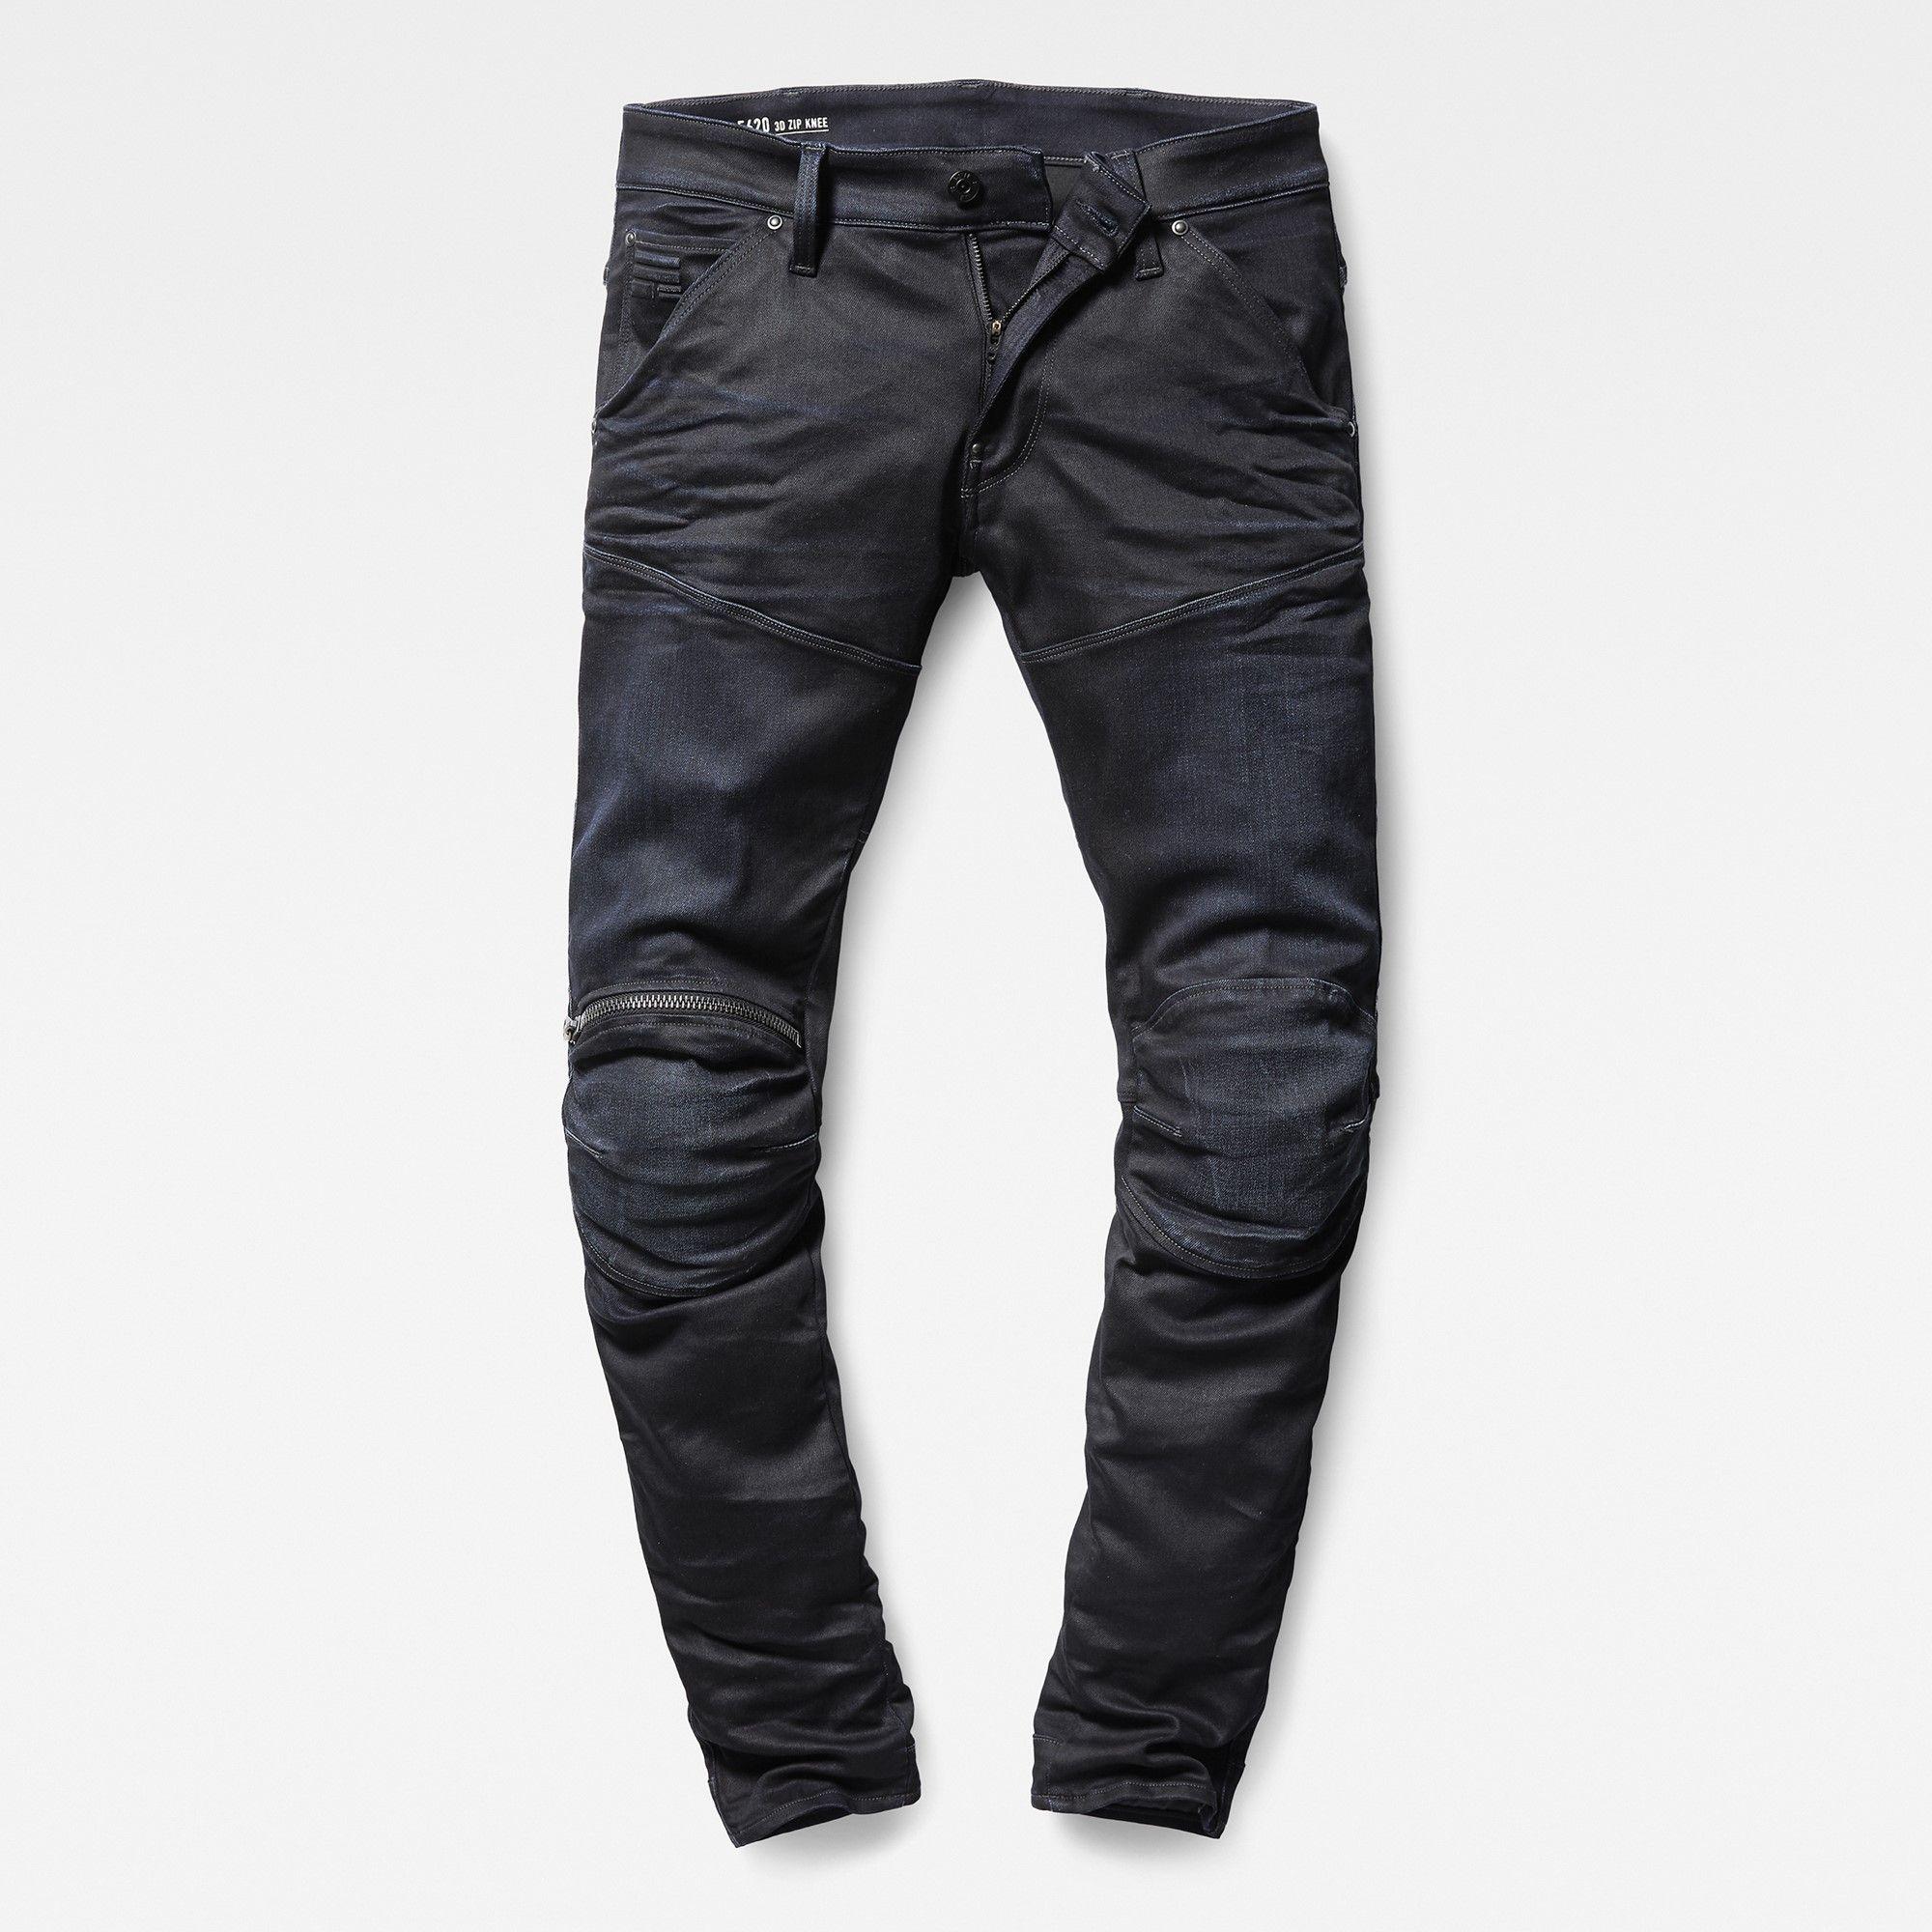 a5edb1877702 5620 G-Star Elwood 3D Zip Knee Super Slim Jeans in 2019